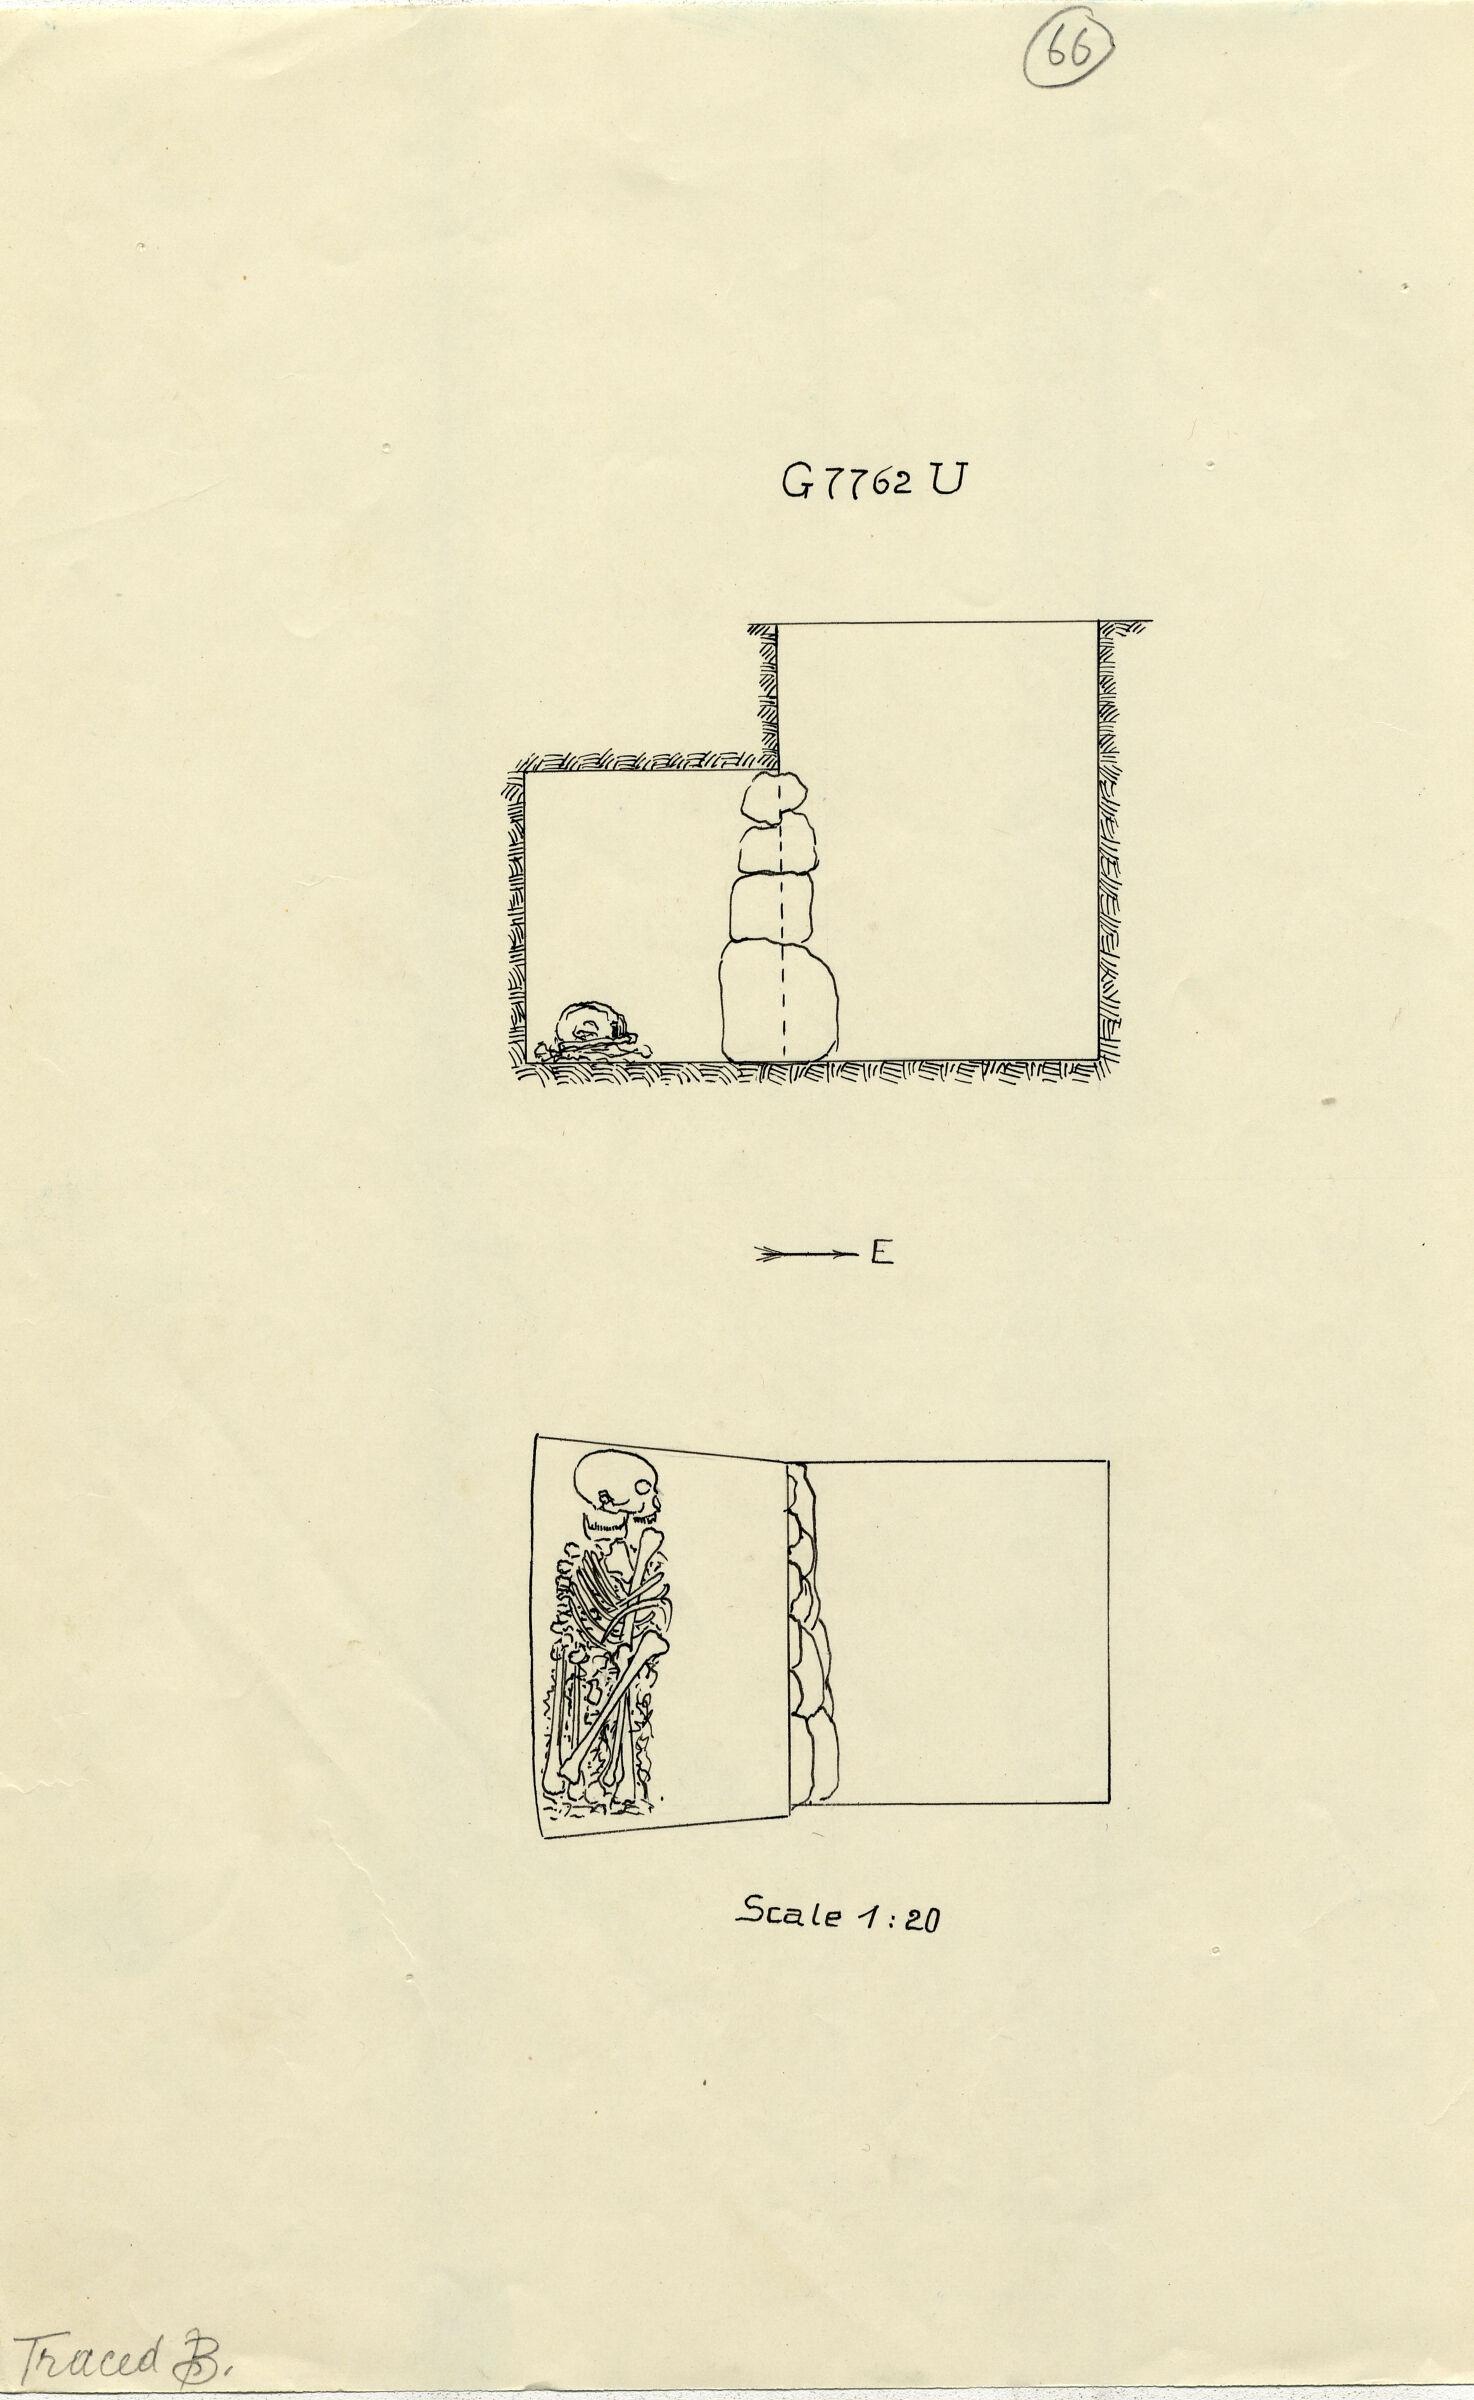 Maps and plans: G 7762, Shaft U